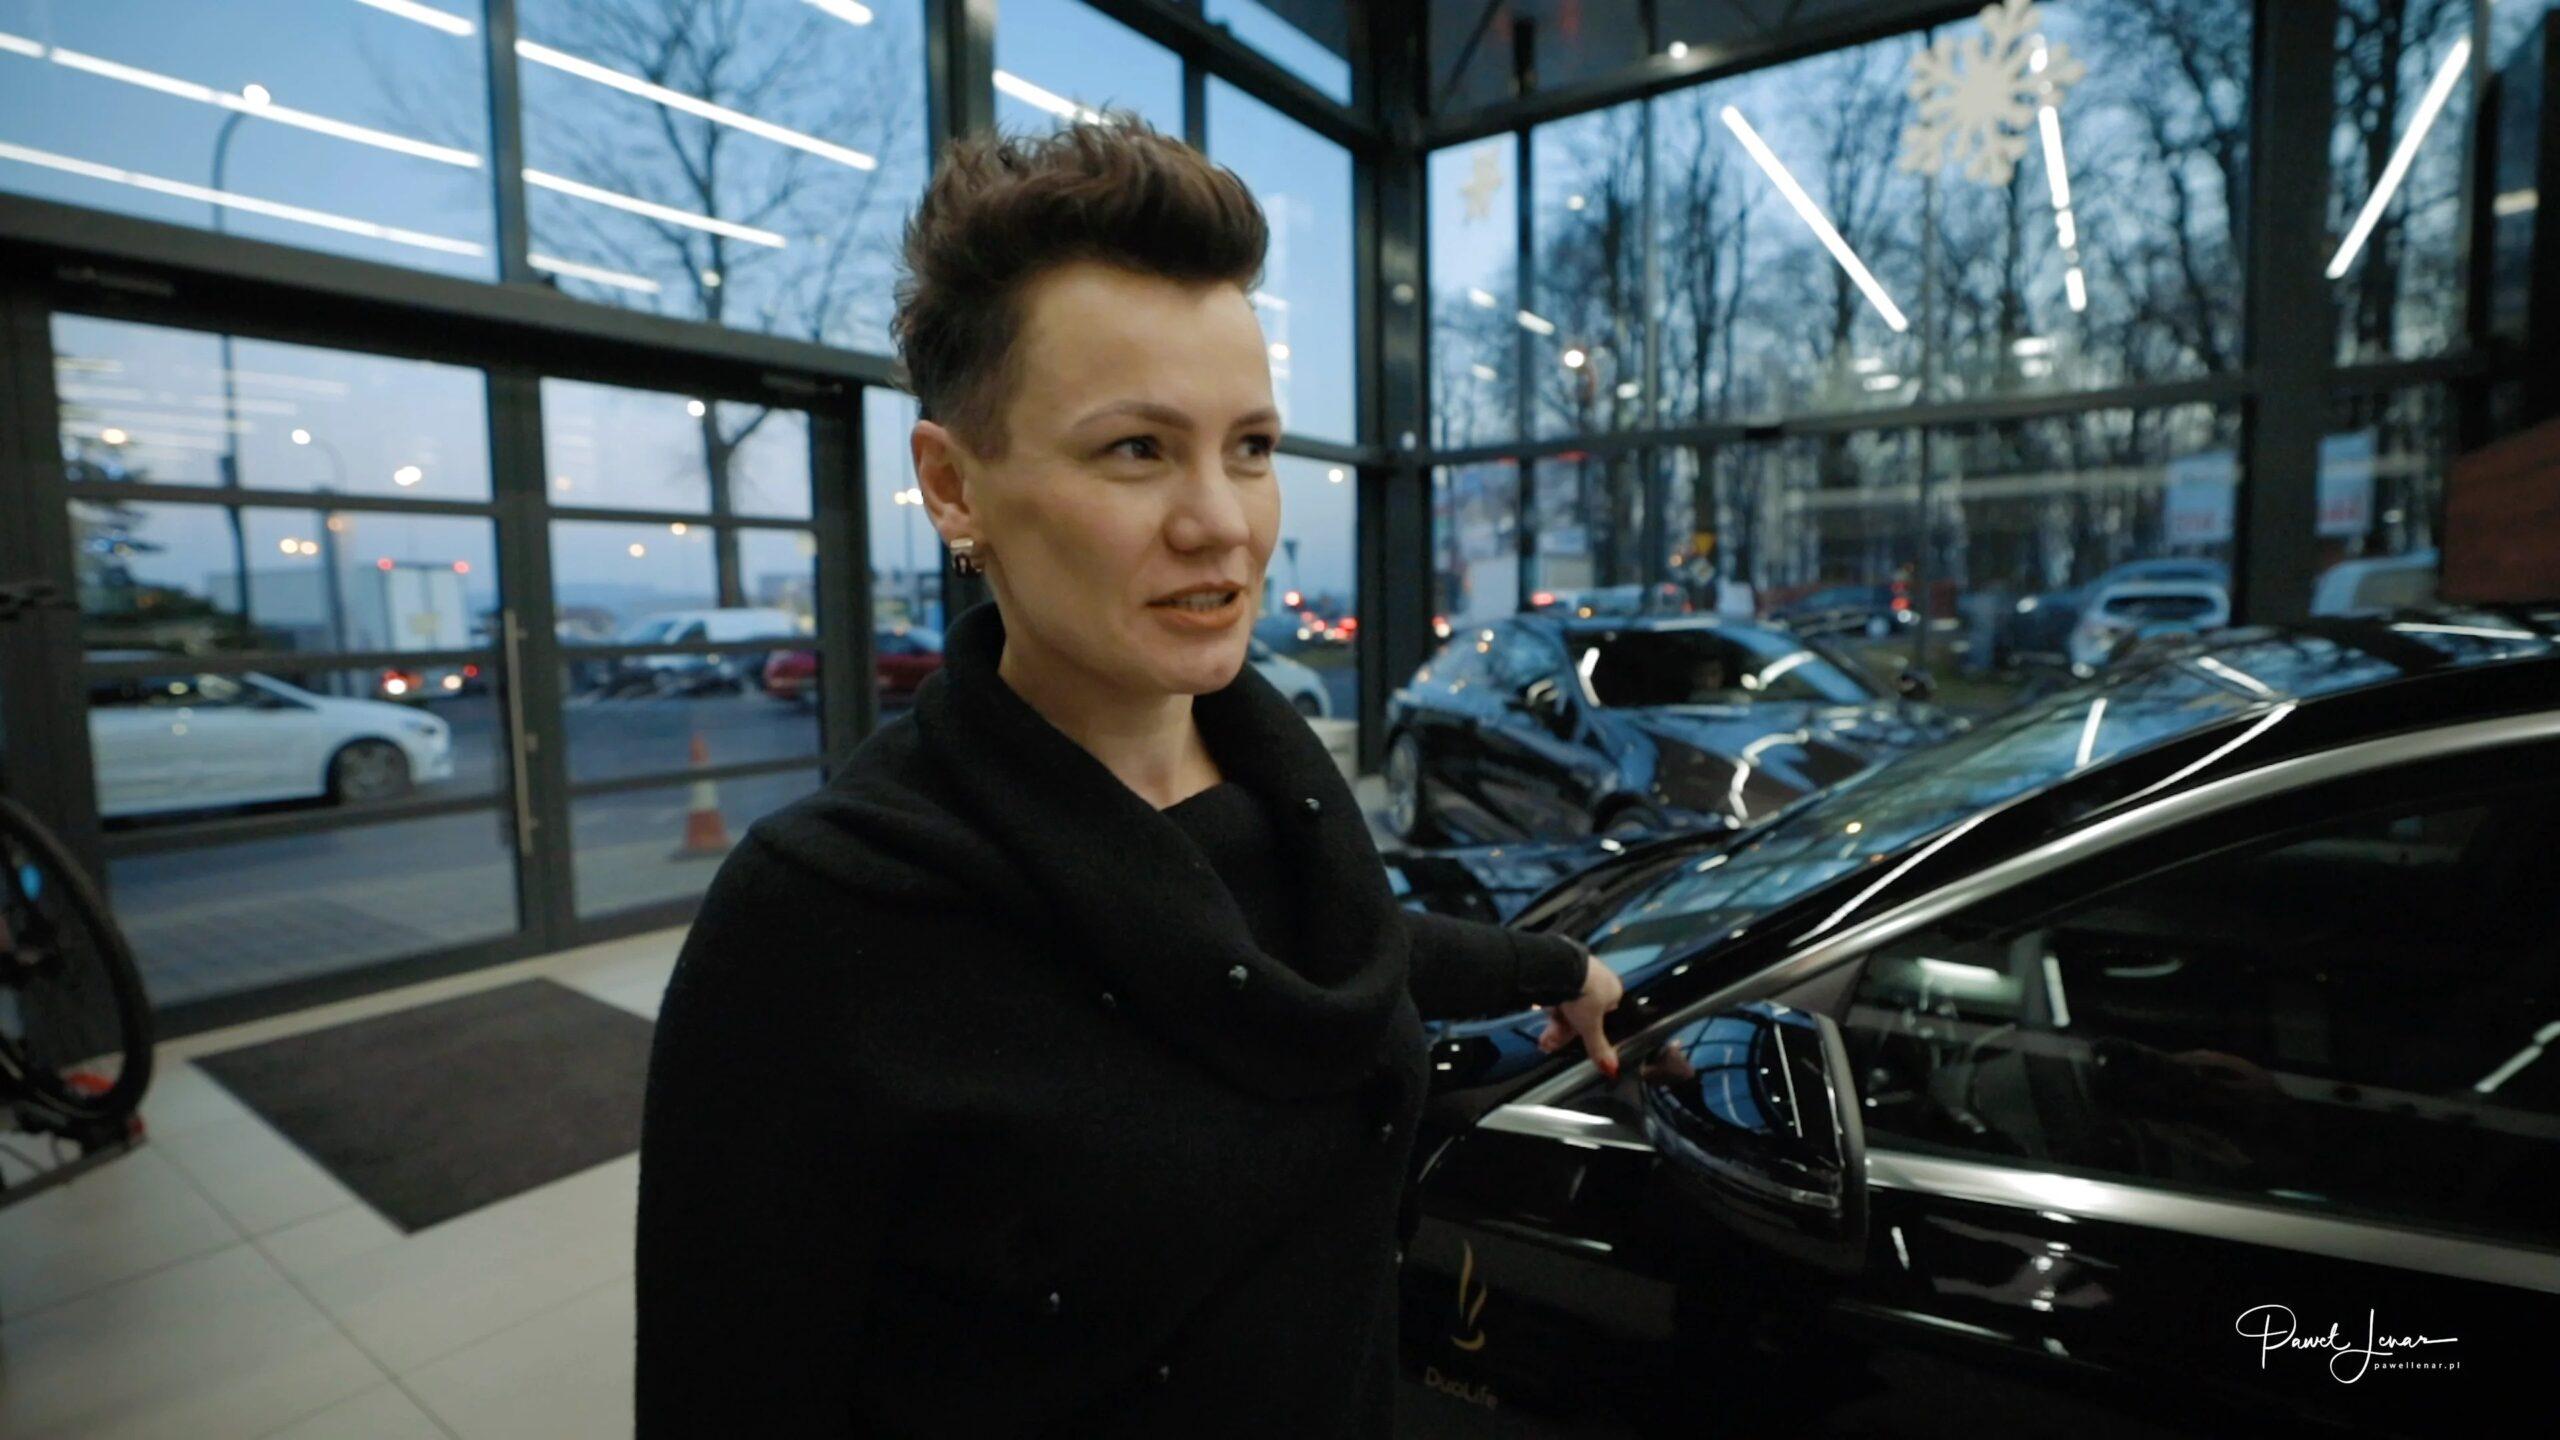 Odbiór Wymarzonego Mercedesa Magda Horochowik scaled - Paweł Lenar Blog